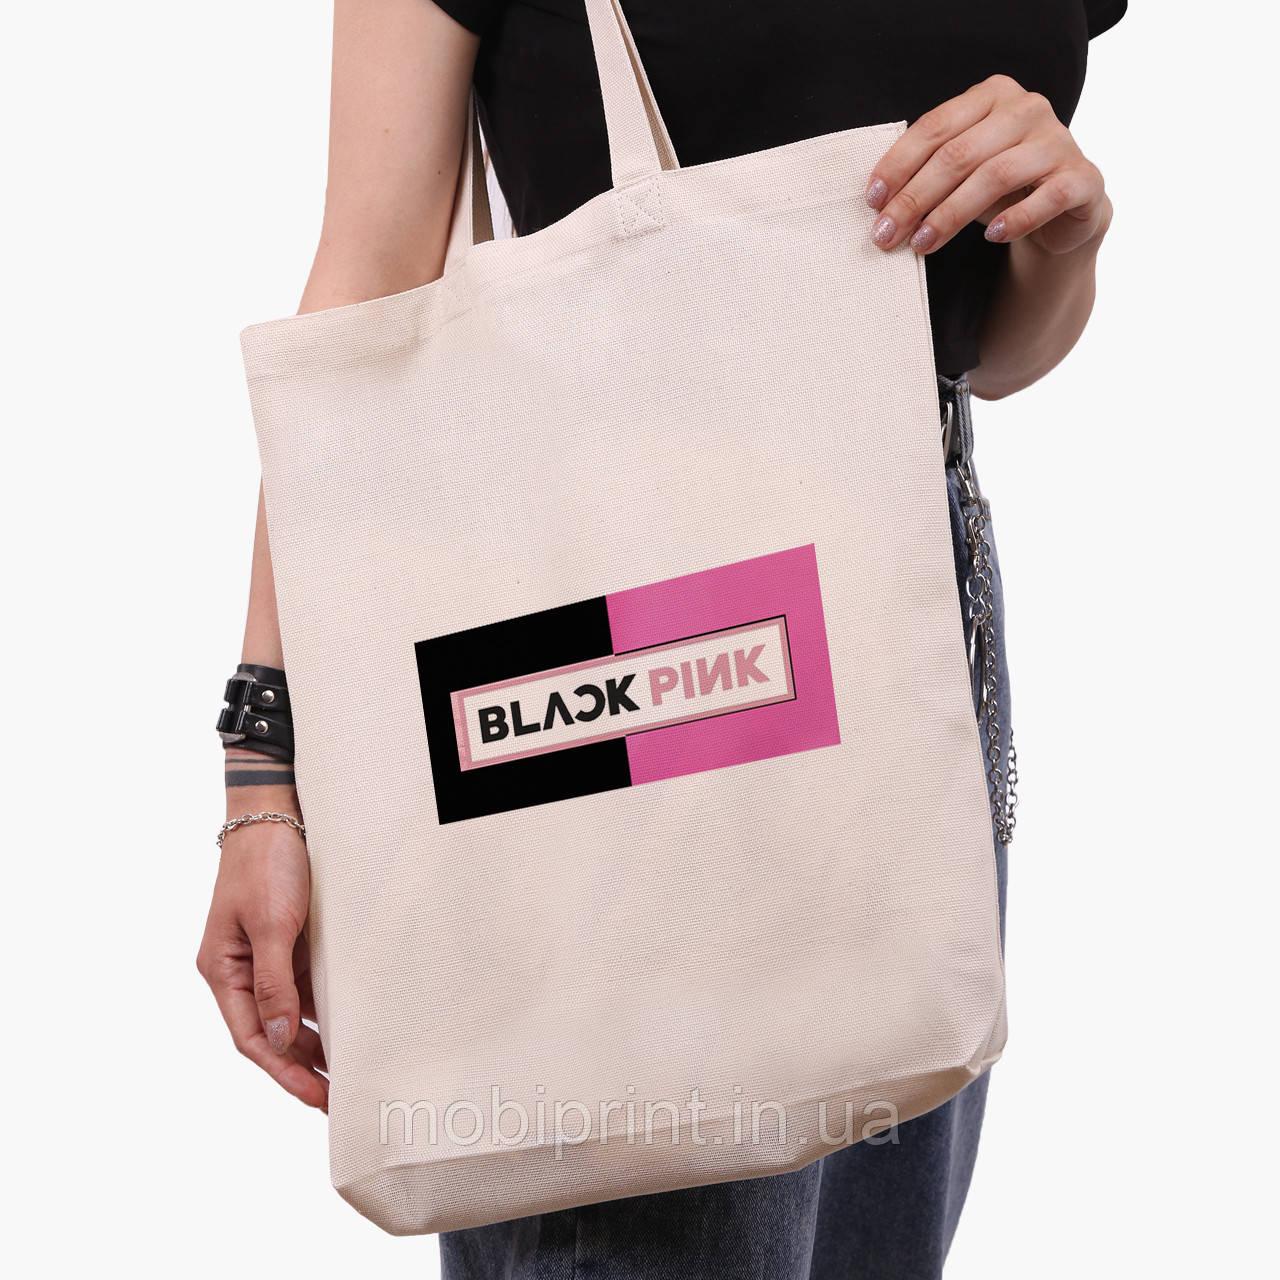 Эко сумка шоппер белая Блек Пинк (BlackPink) (9227-1344-1)  экосумка шопер 41*39*8 см